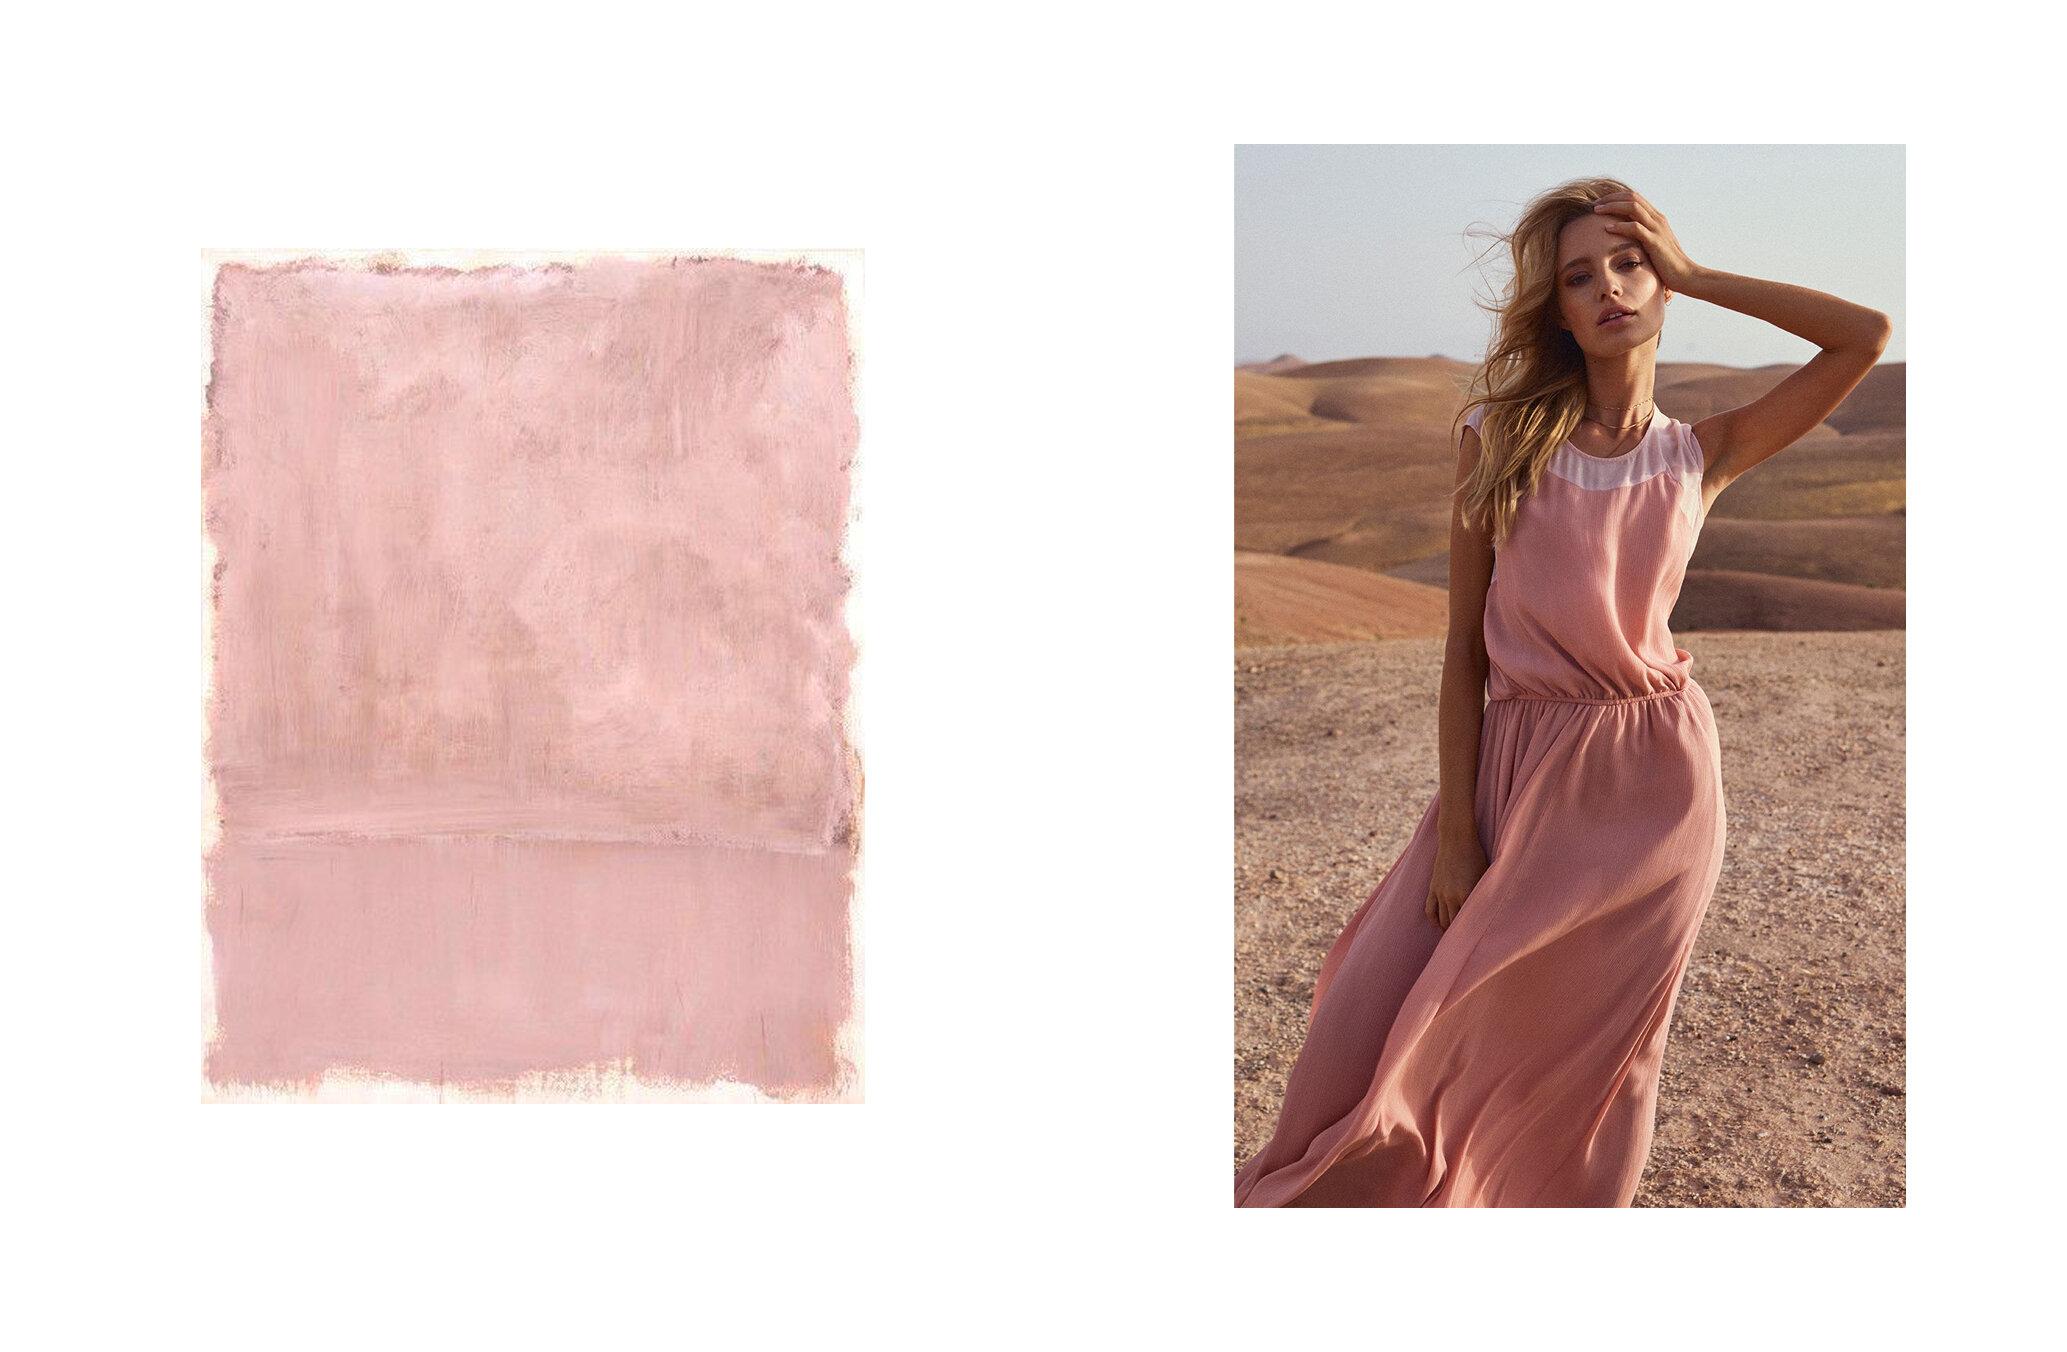 pink sand 2 photos.jpg